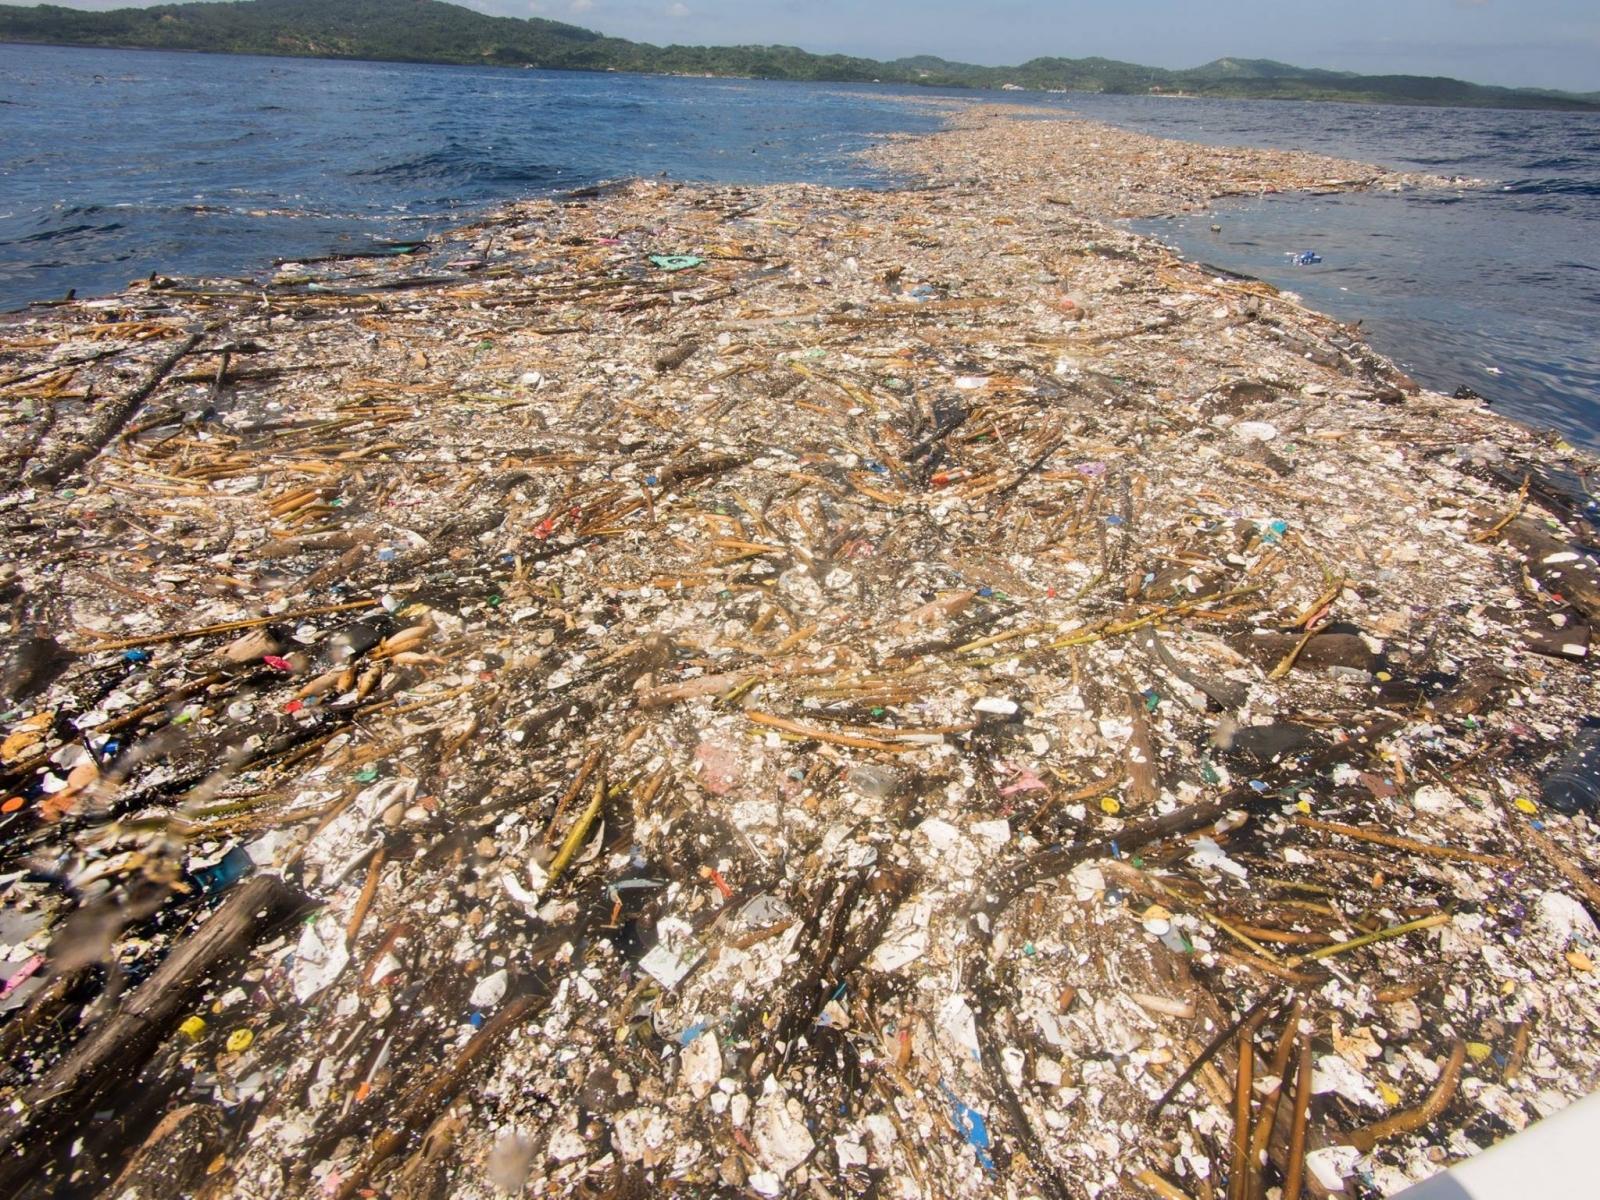 Roatan's trash island